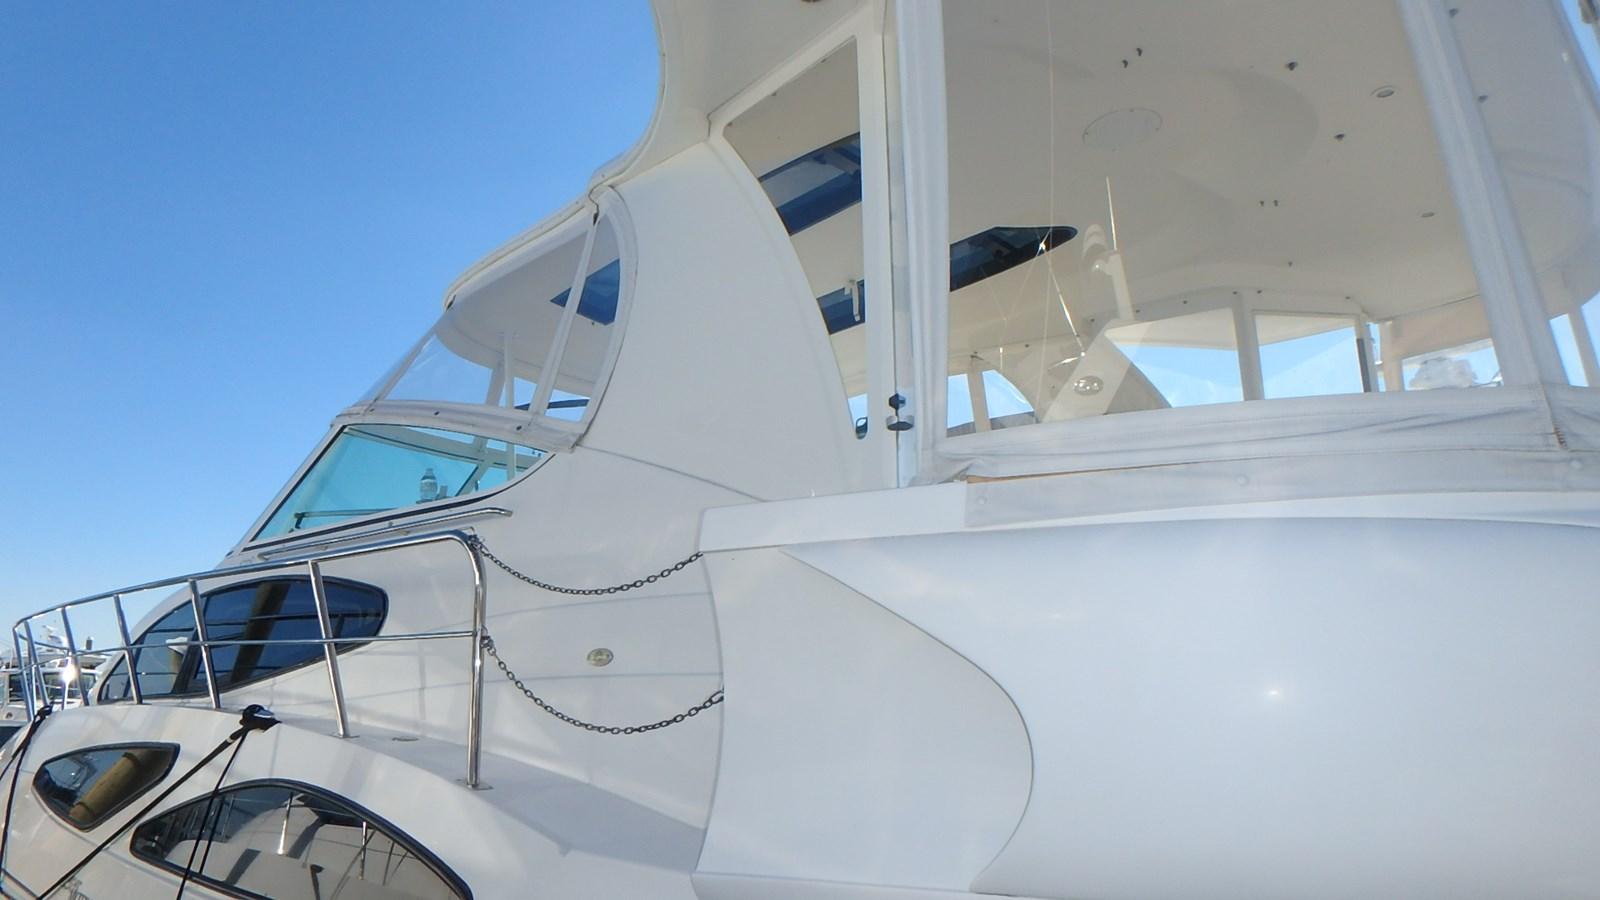 P1160914 2005 CRUISERS YACHTS 455 Express Motoryacht Motor Yacht 2522202